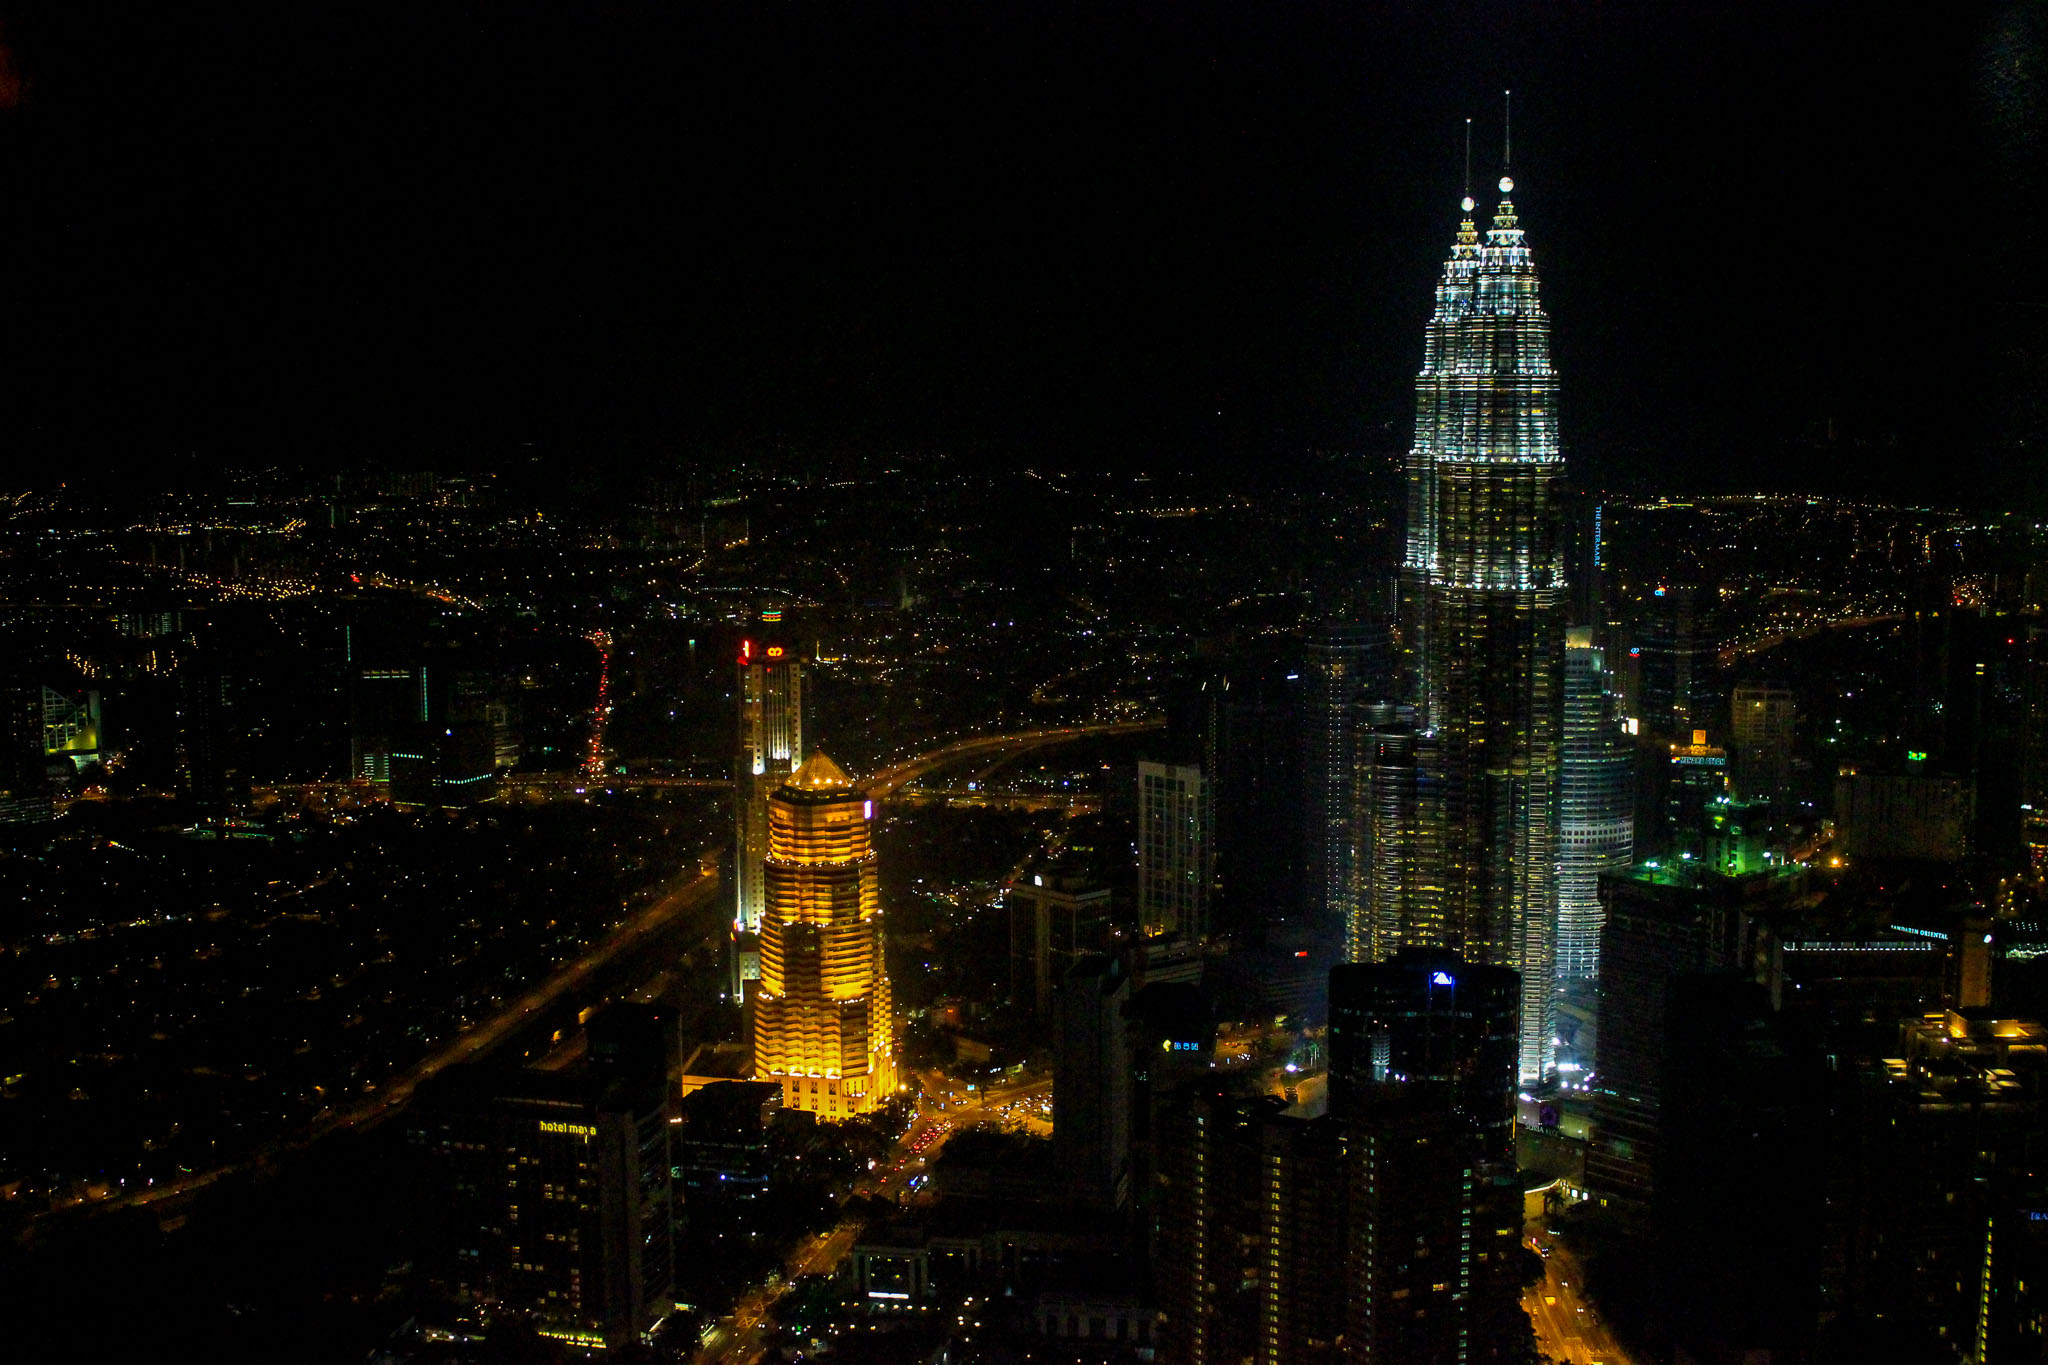 Malaysia - altogheter